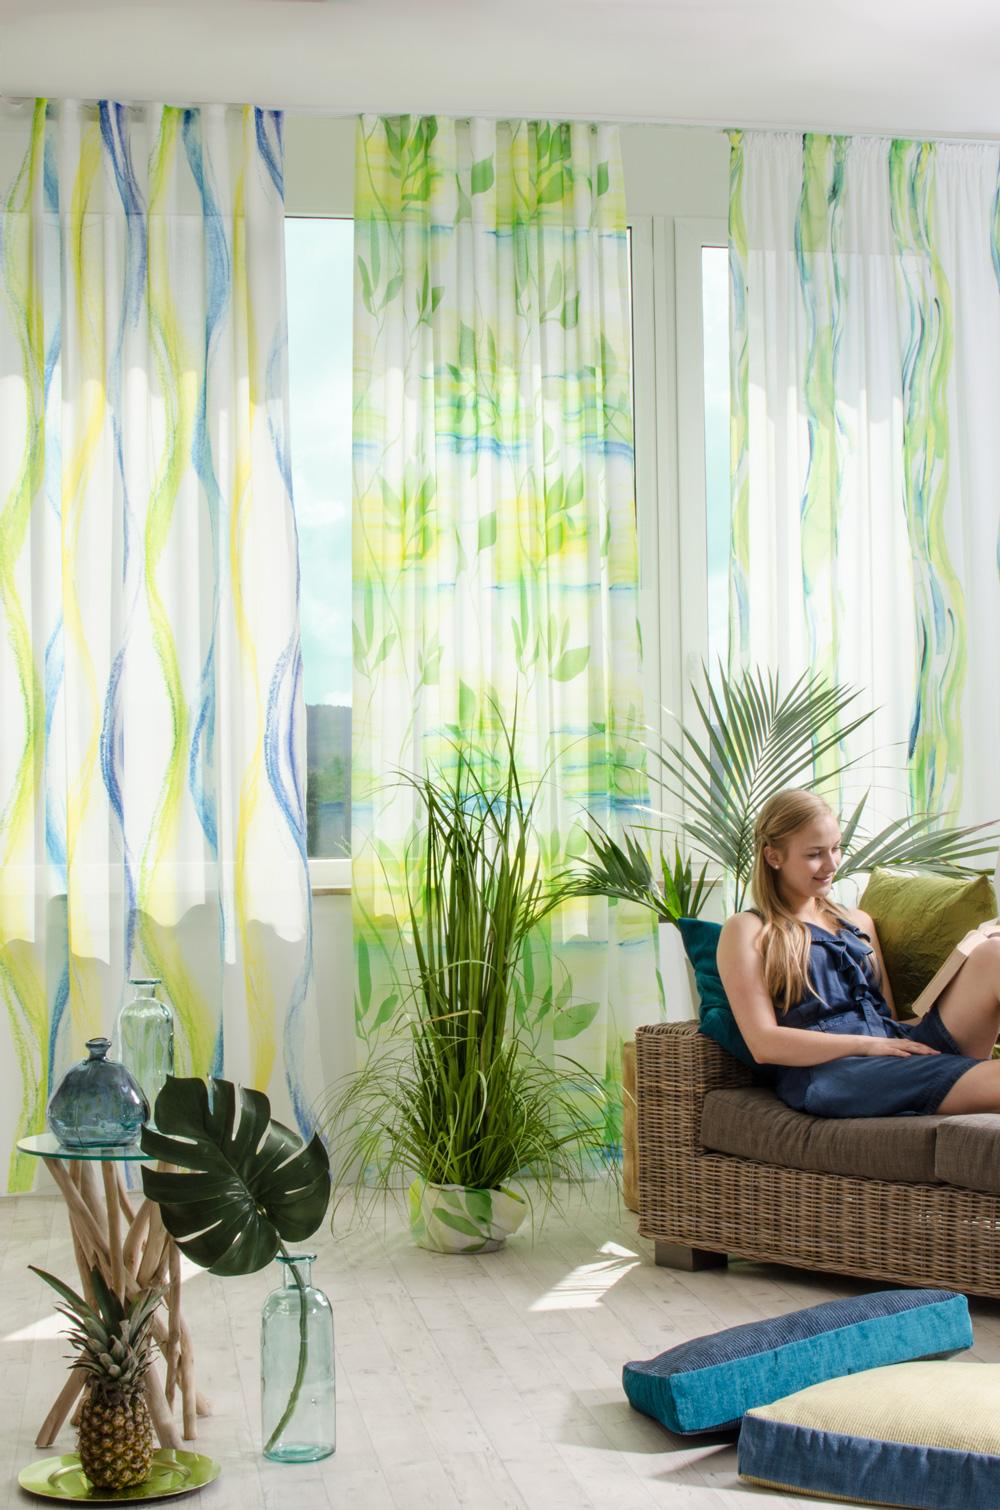 initiative textile r ume. Black Bedroom Furniture Sets. Home Design Ideas